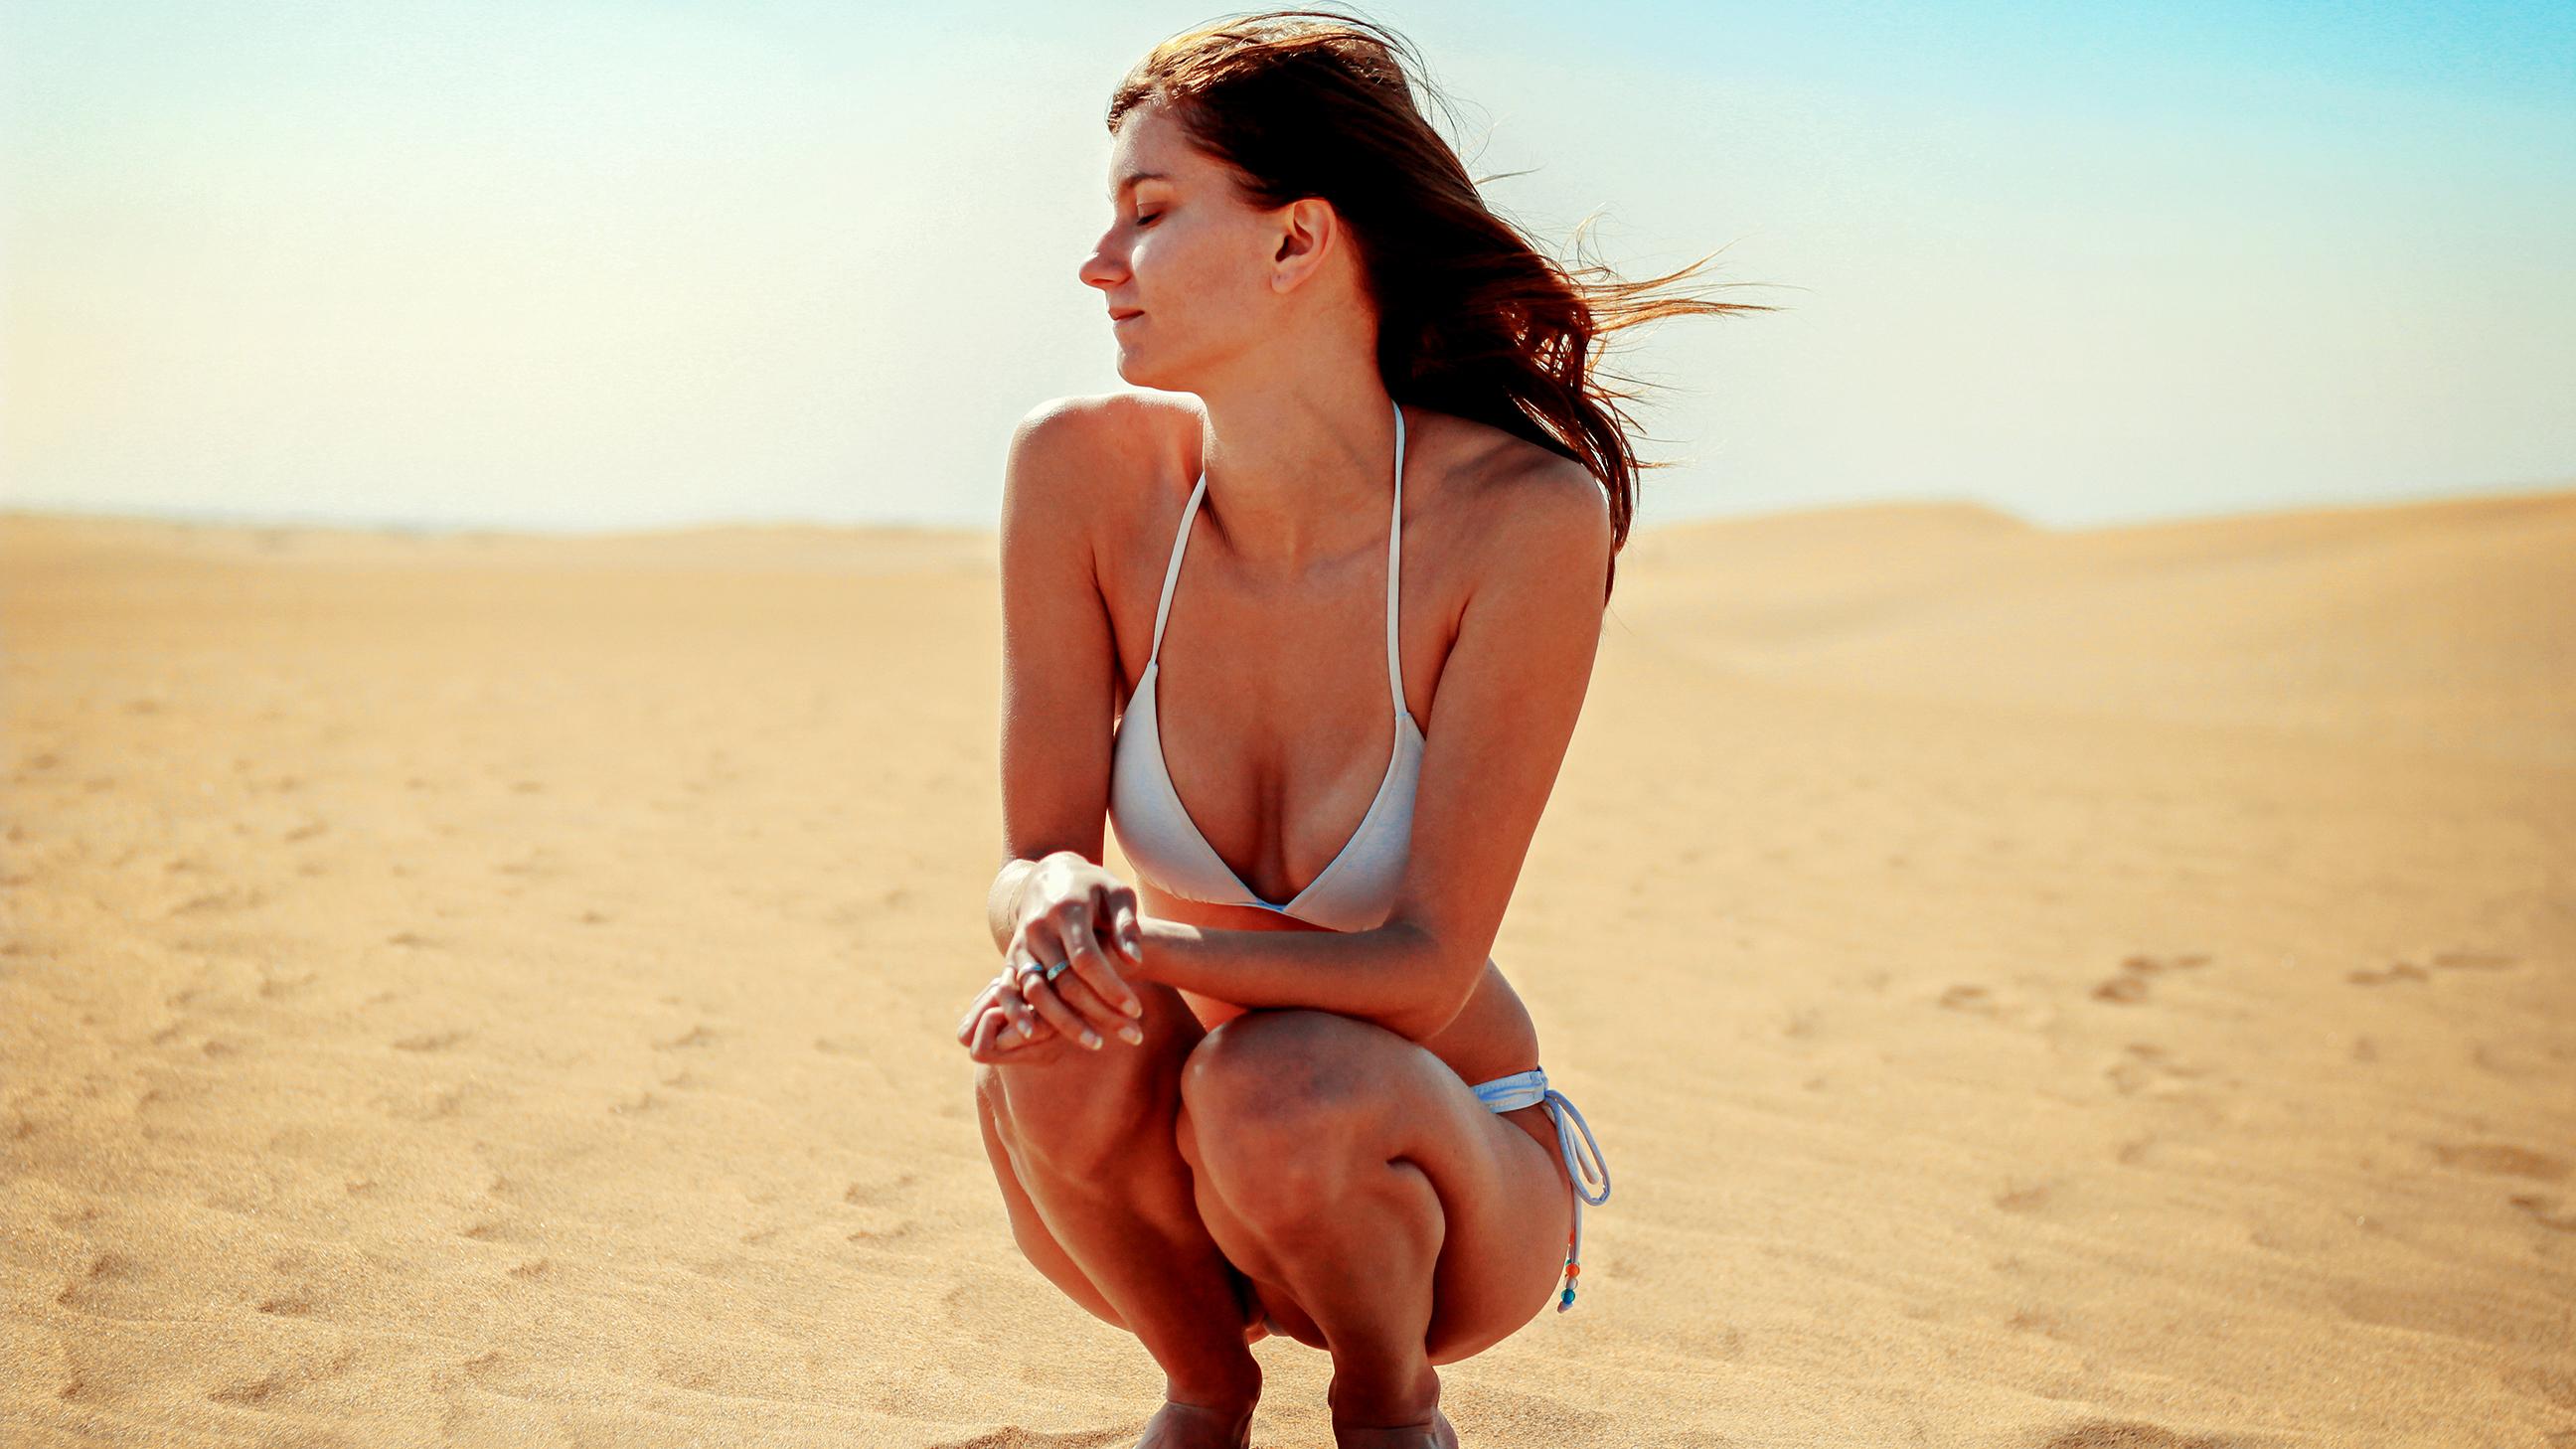 bikini-in-in-photo-women-beach-nude-short